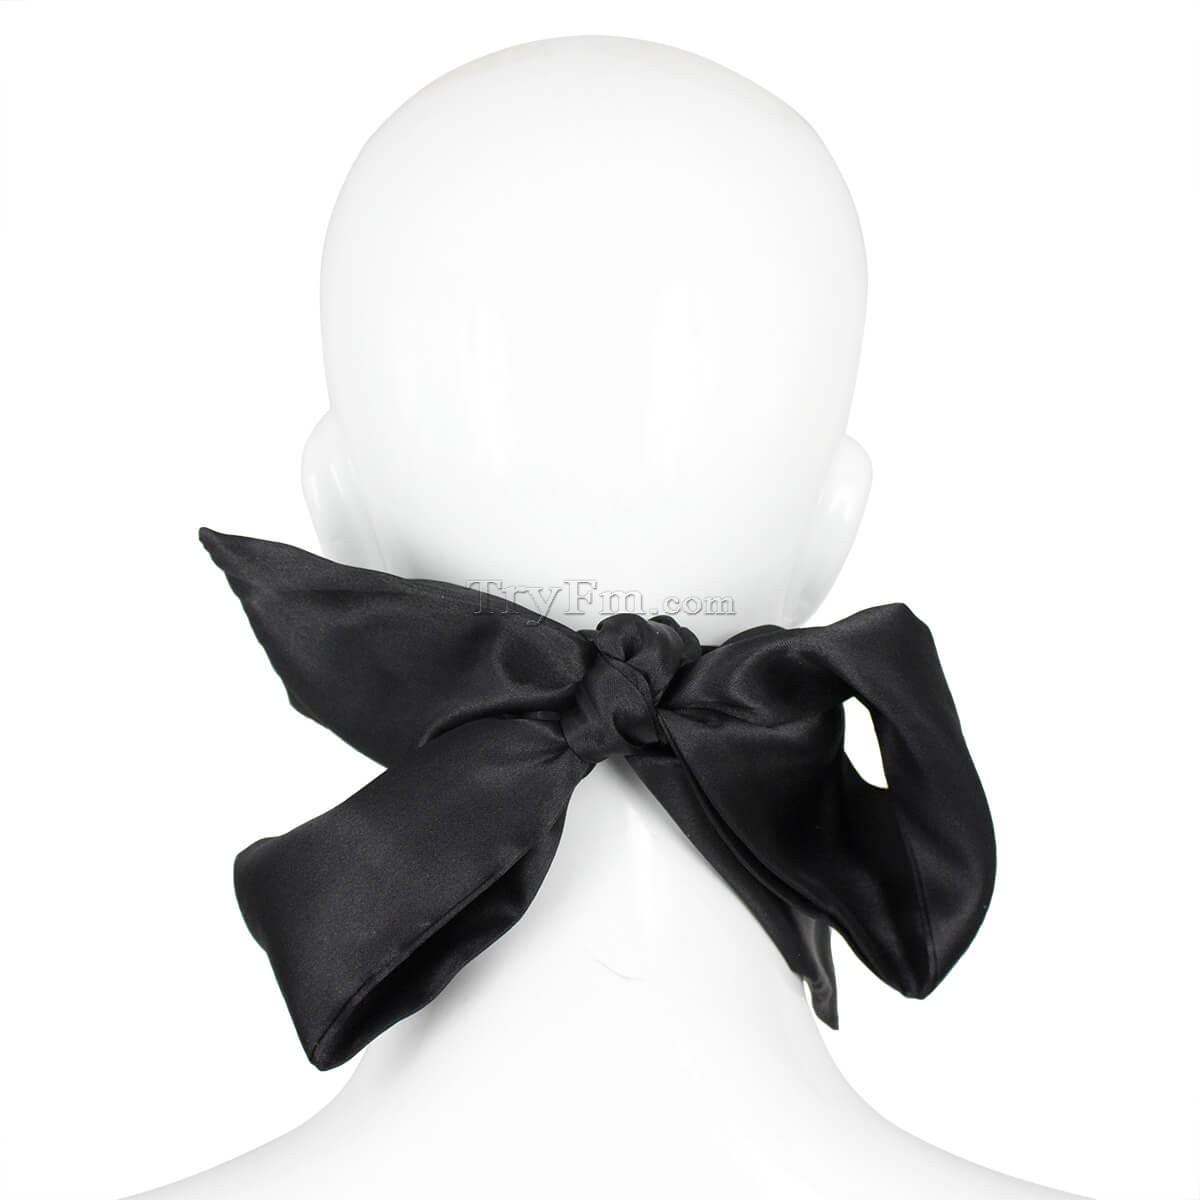 6-Black-Riband-Eyefold-Gag-6.jpg